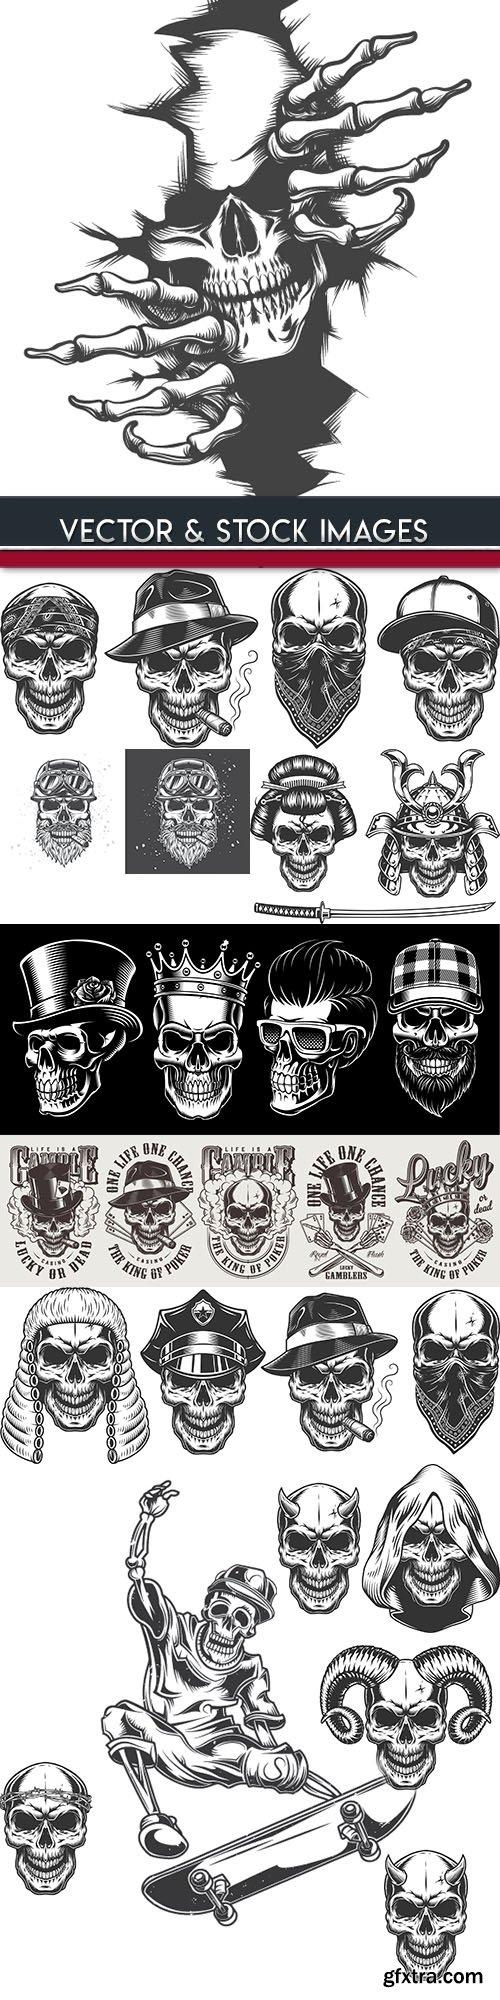 Skull and accessories grunge label drawn design 5